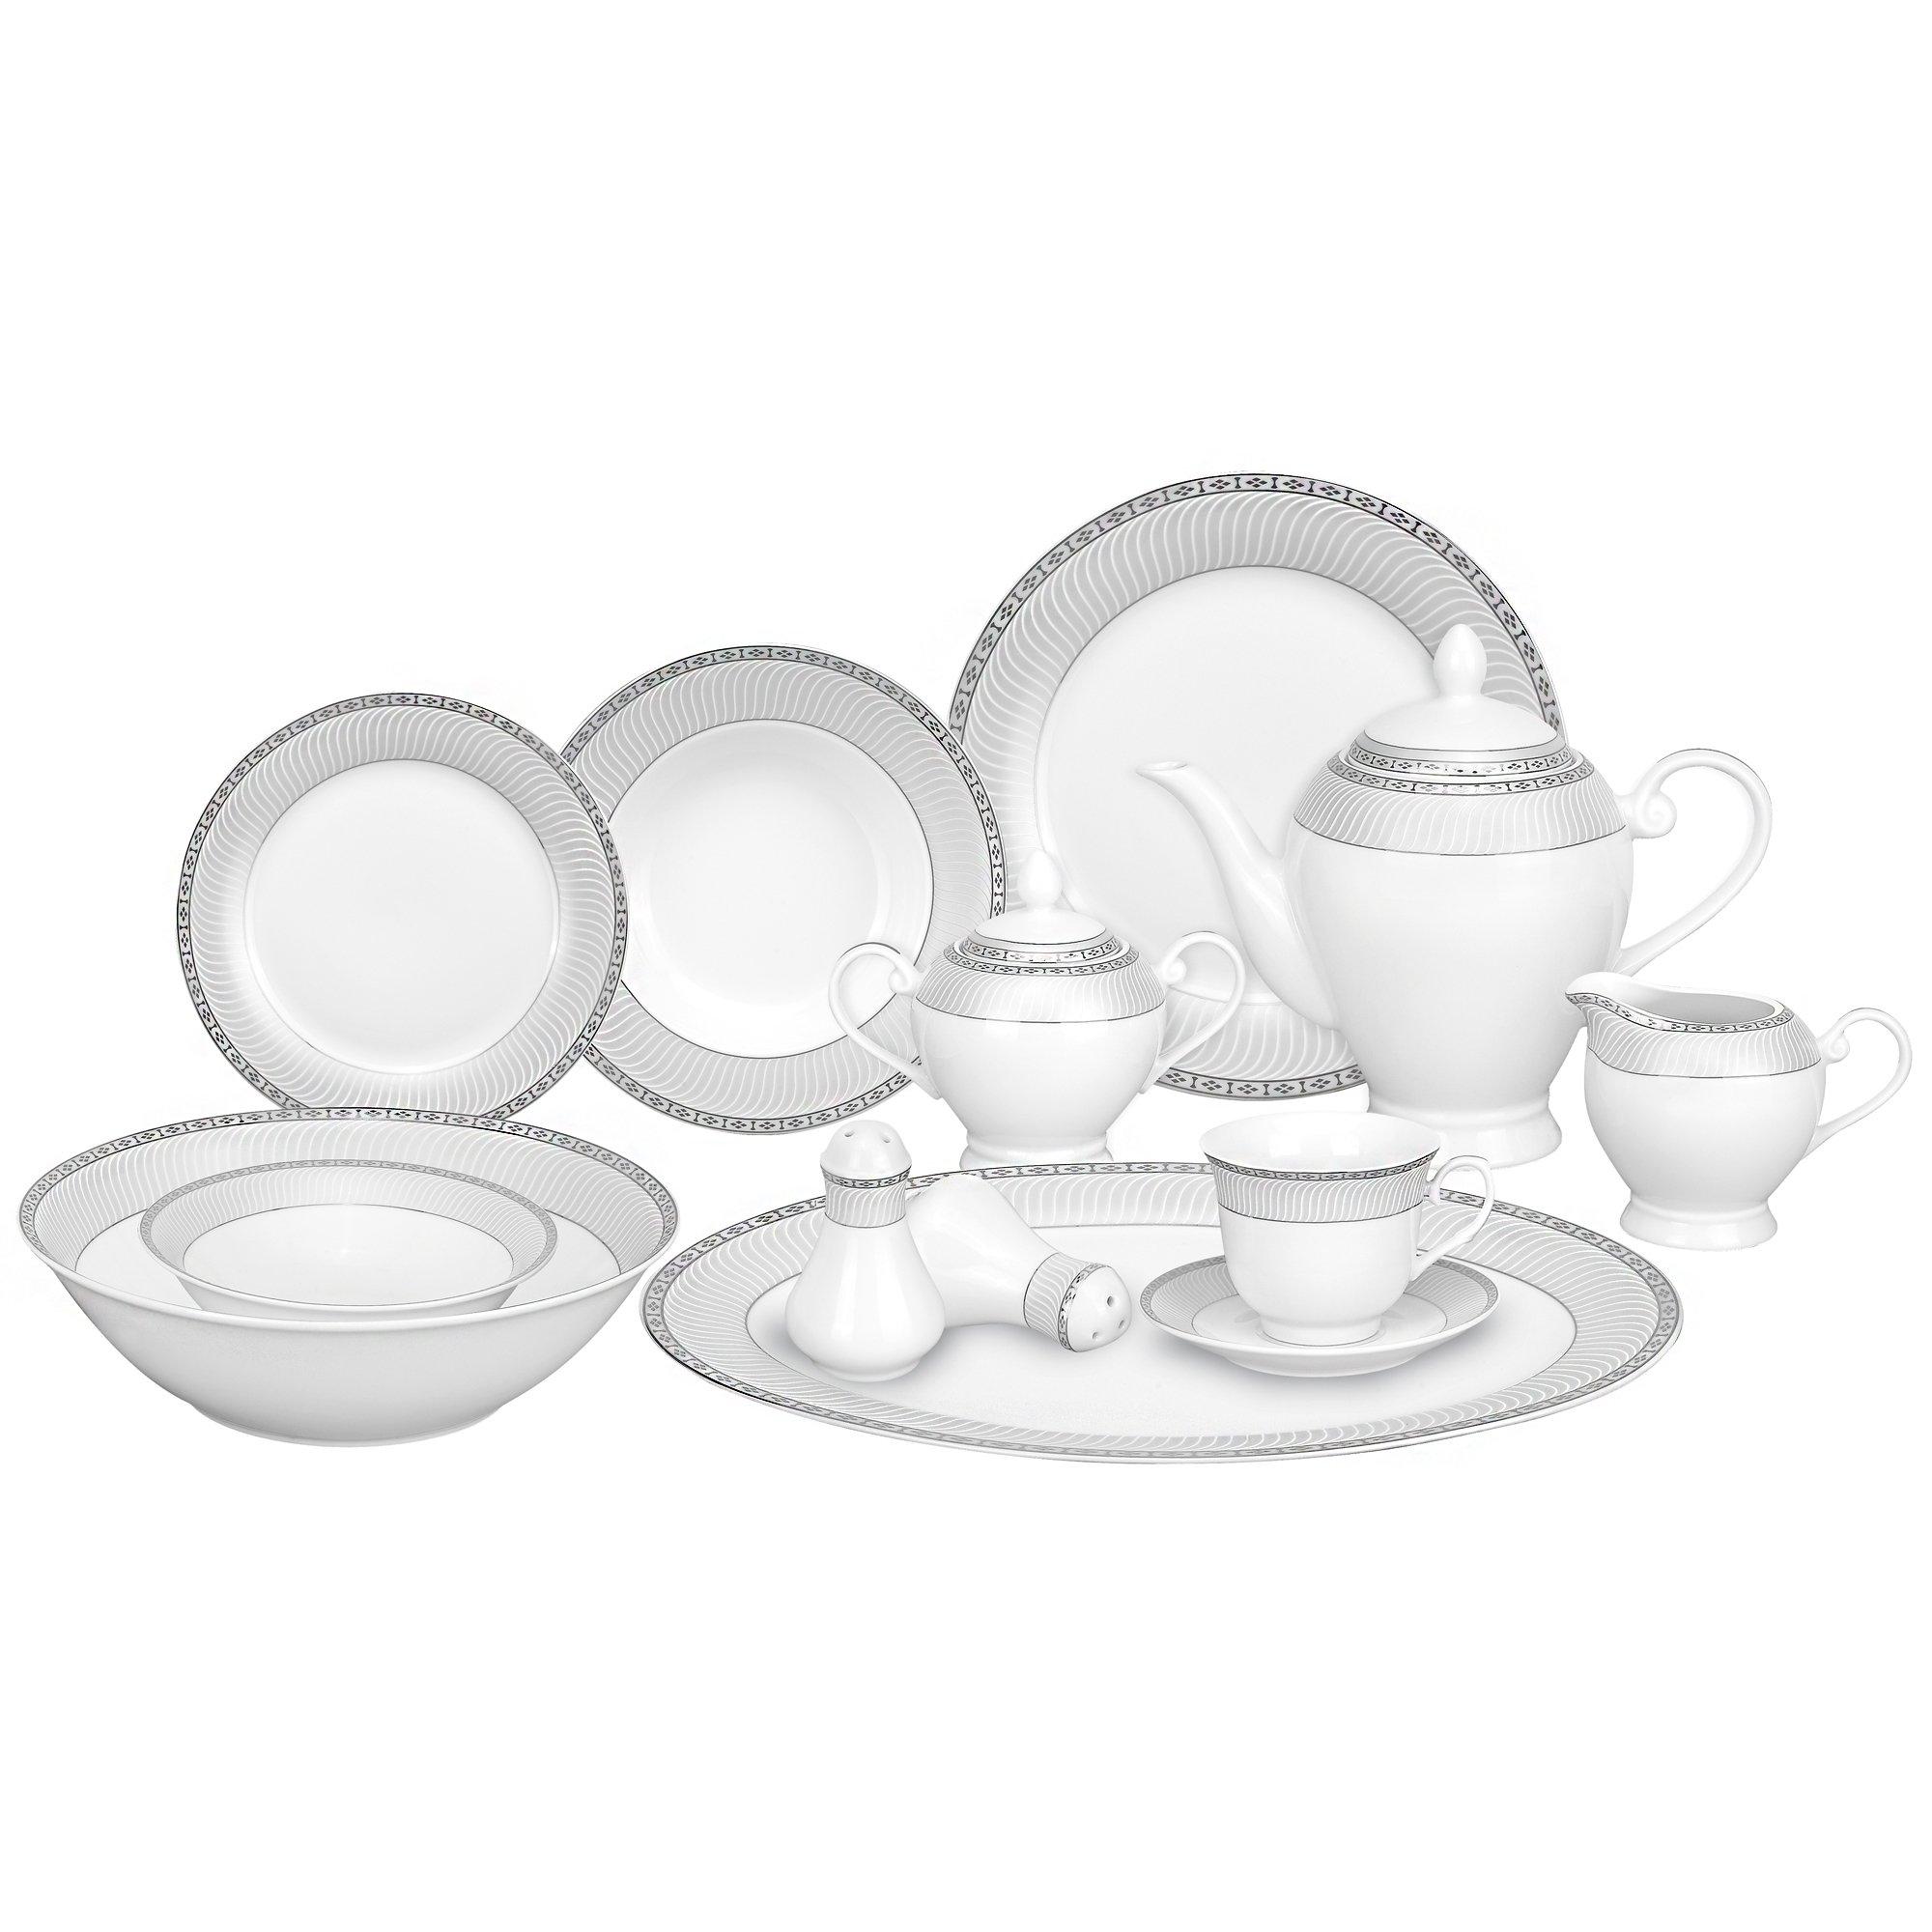 Lorren Home Trends 57-Piece Porcelain Dinnerware Set, Alina-SL, Service for 8 by Lorren Home Trends